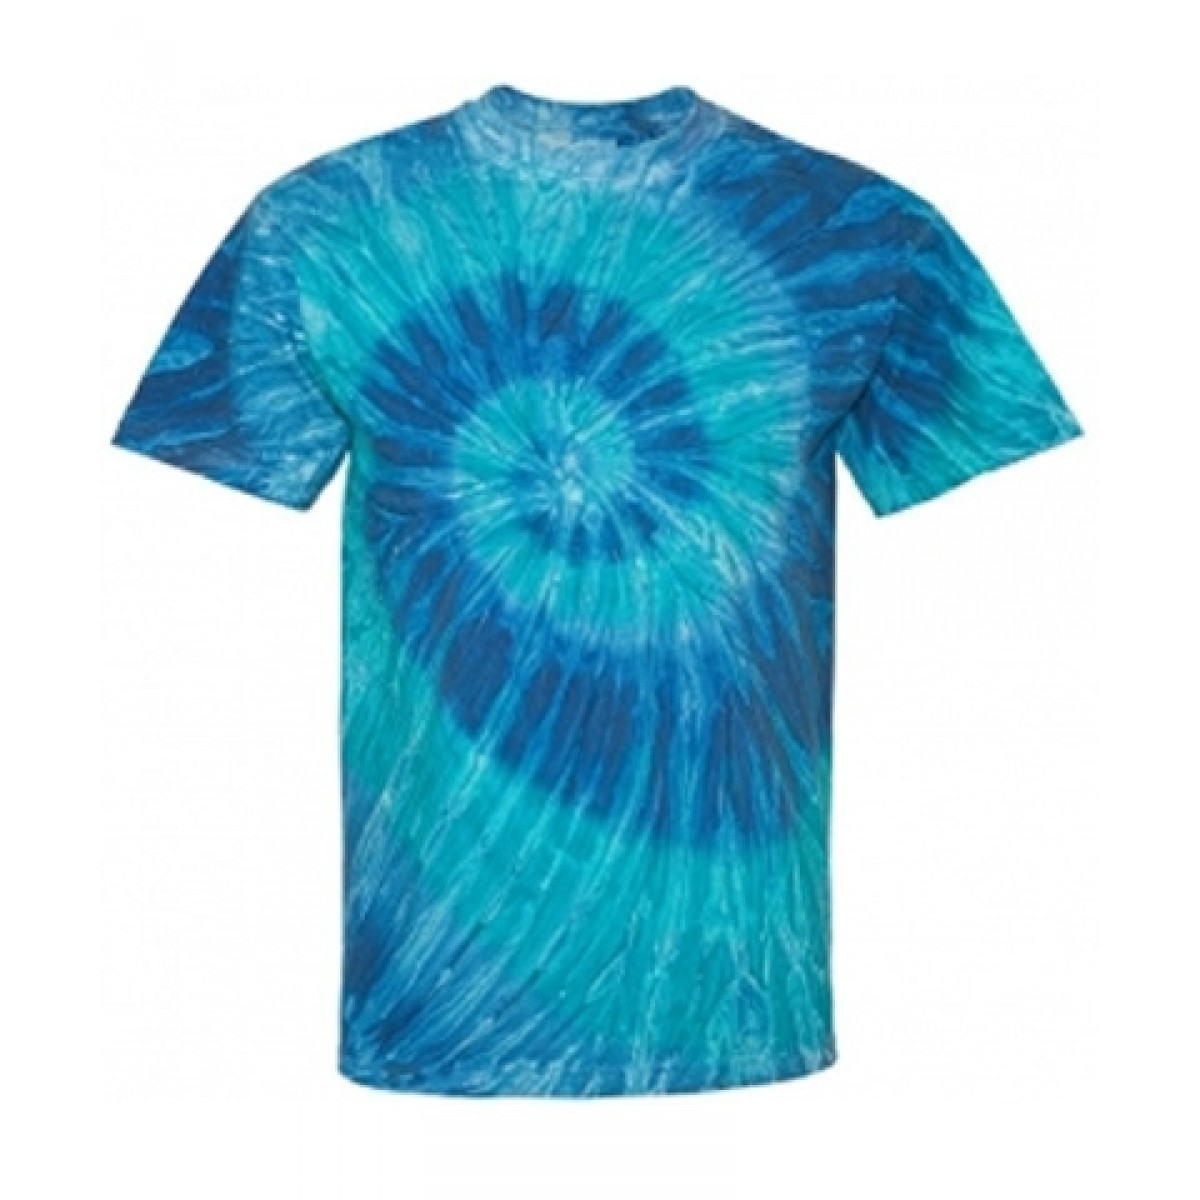 Blue or Black Ripple Tie Dye T-Shirt-Scuba Blue -3XL